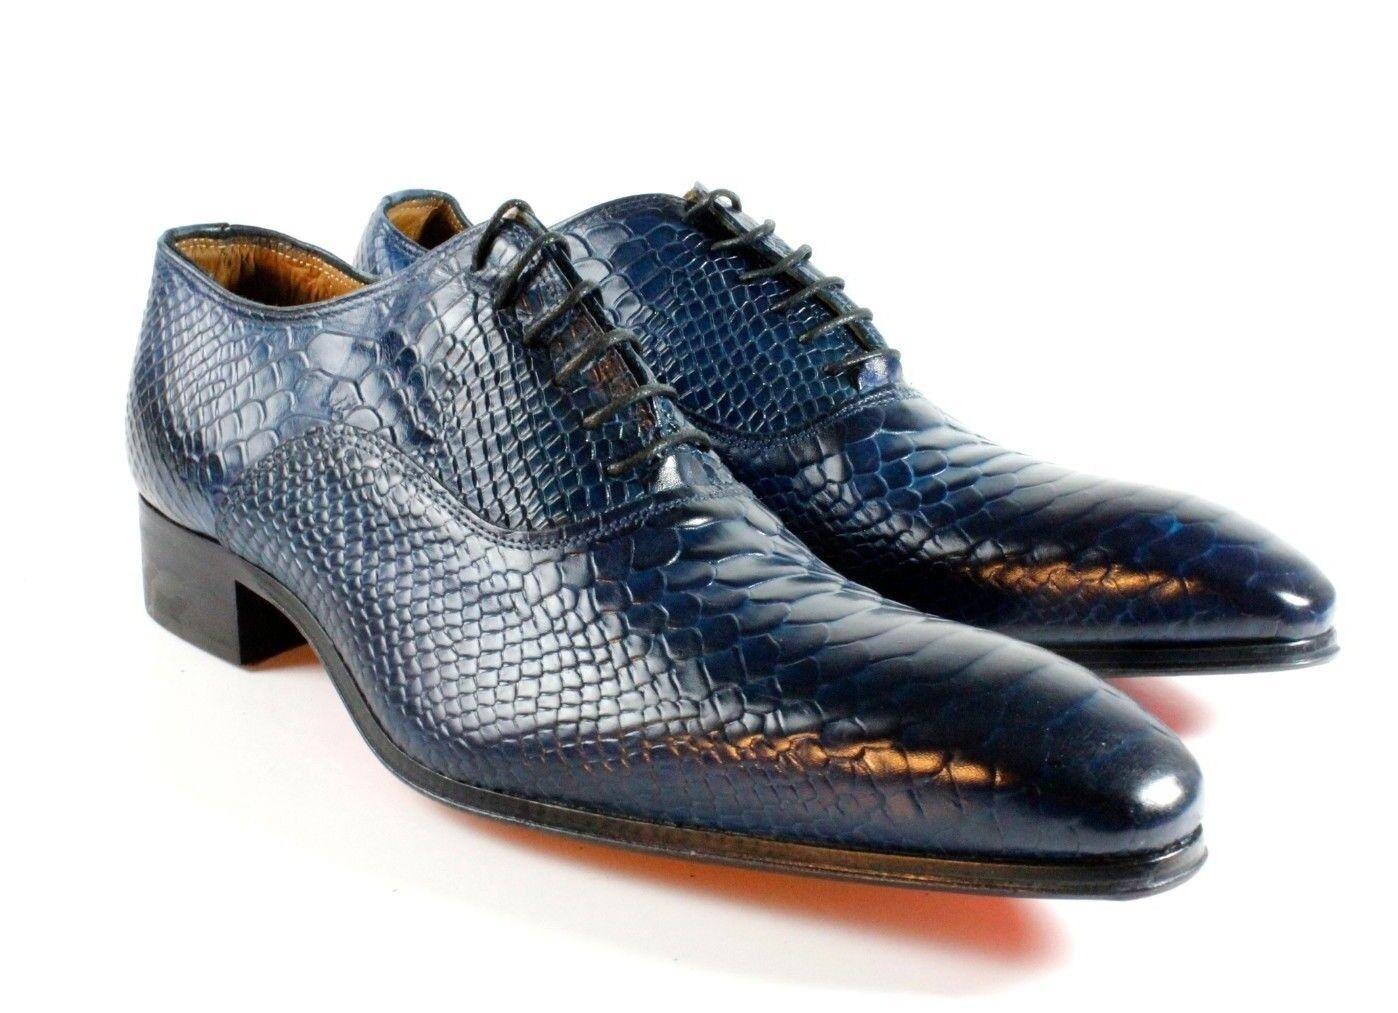 Ivan Troy Dunkelblau Krokodil Handgefertigt Italienisches Leder Formelle Schuhe